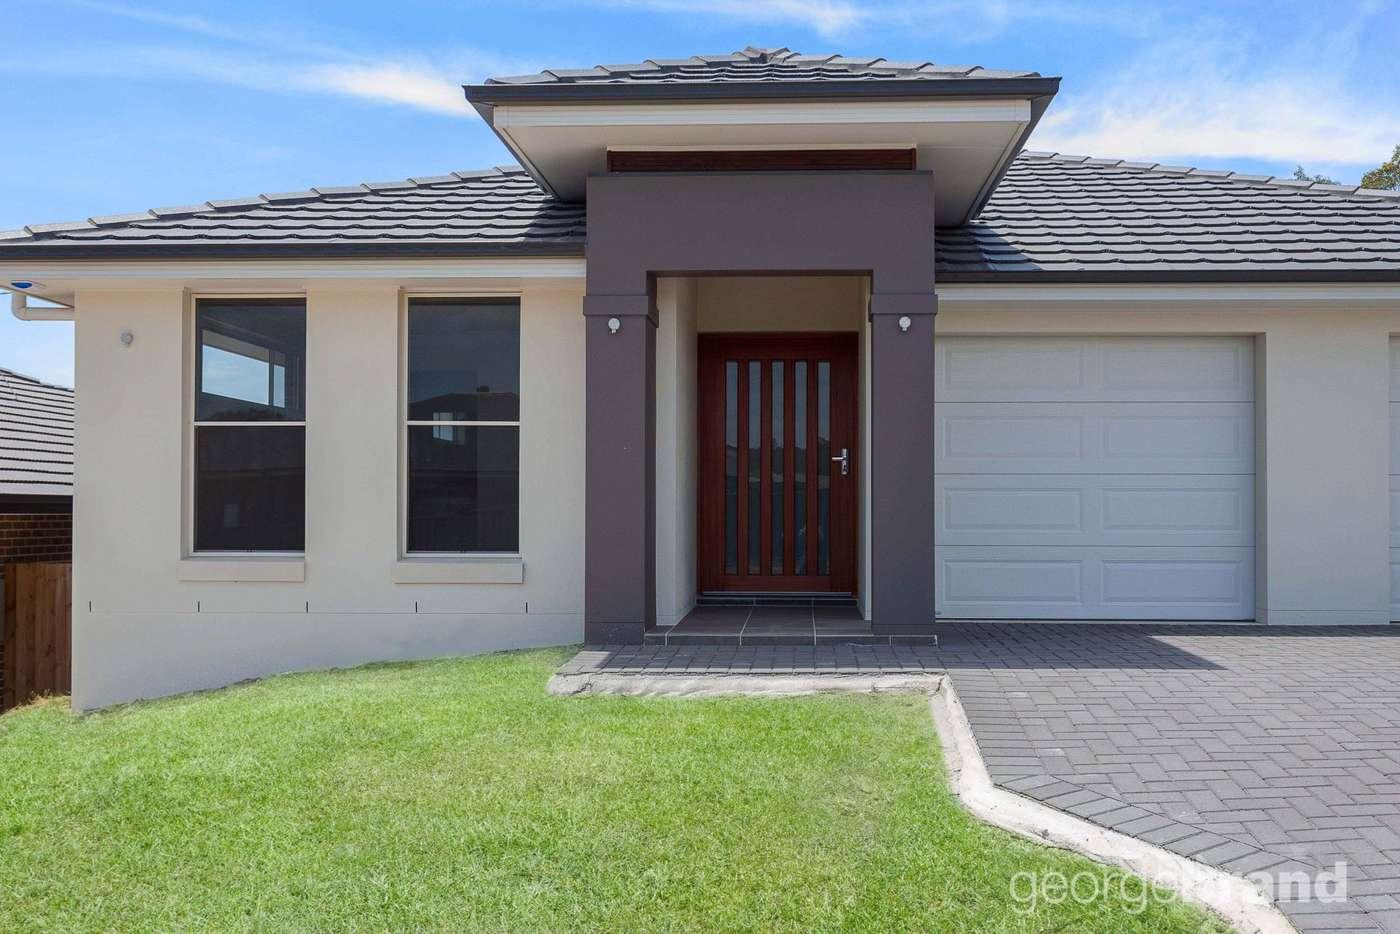 Main view of Homely house listing, 3 Sandridge Street, Thornton NSW 2322